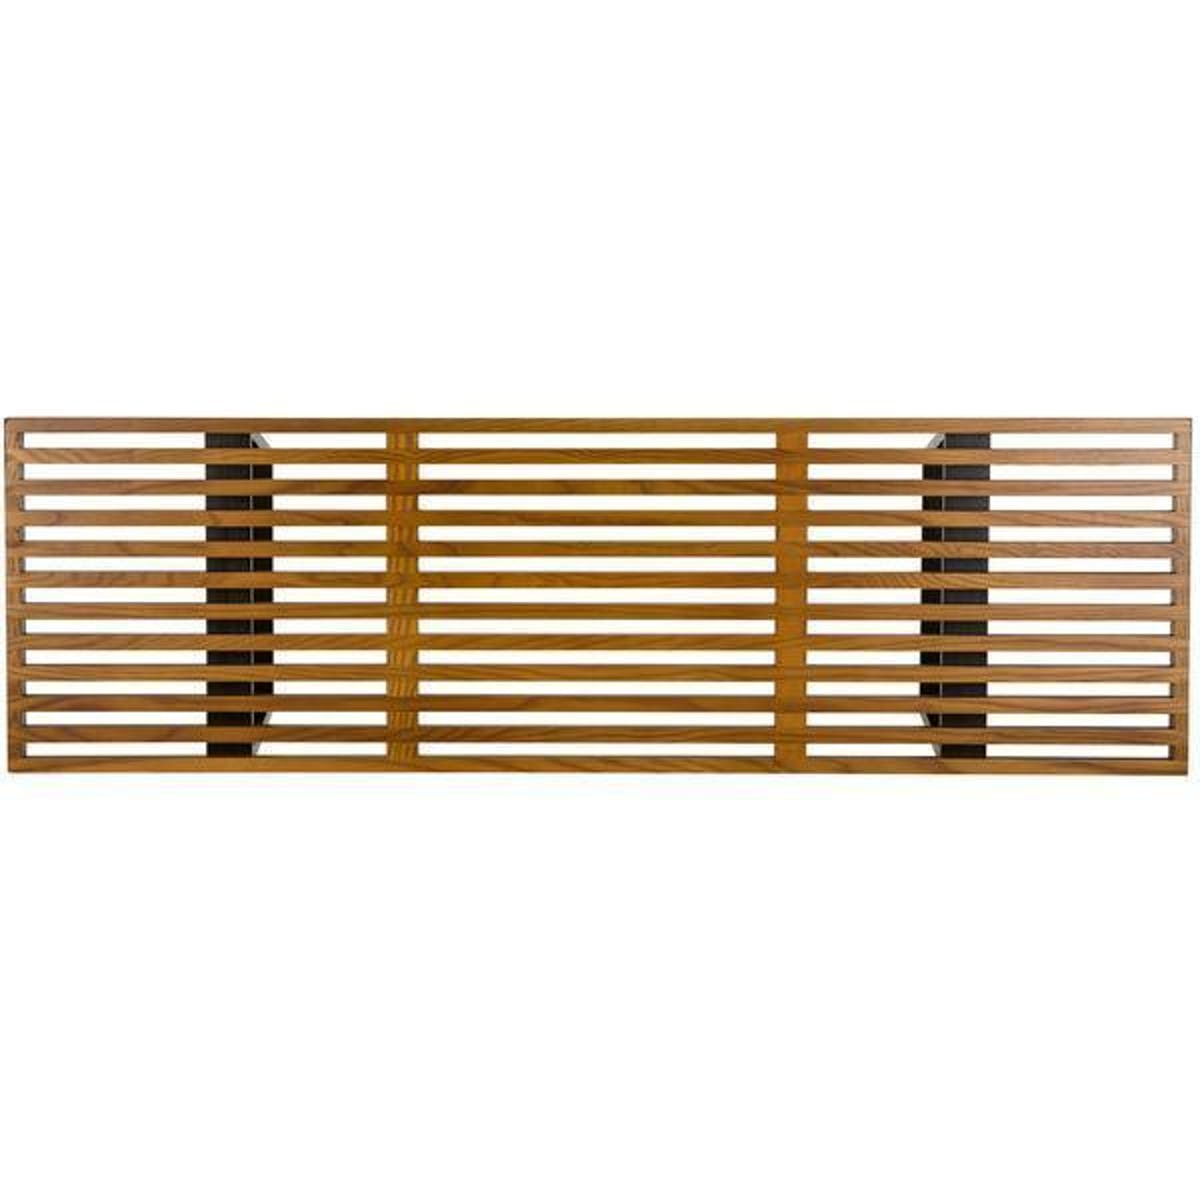 Wood slat clipart clip art transparent stock EdgeMod Slat 5\' Bench In Dark Walnut clip art transparent stock